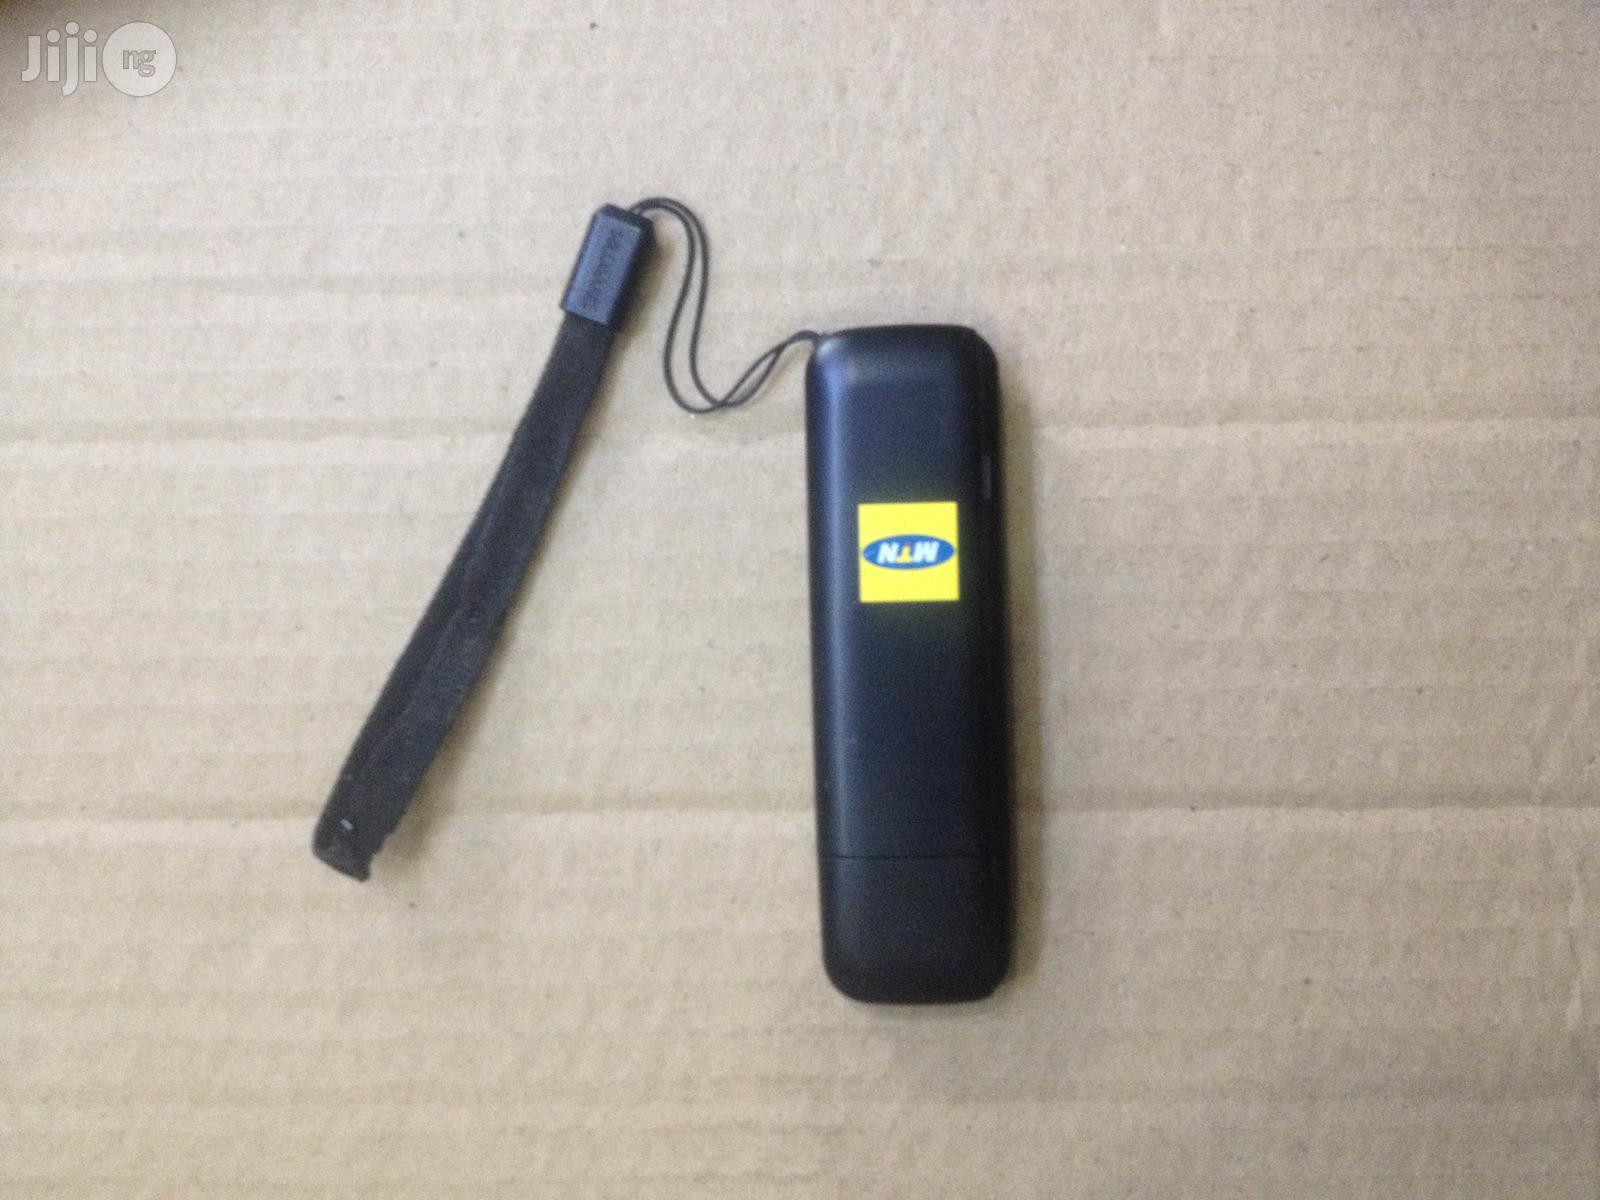 MTN Hsdpa Huawei E156G USB Modem